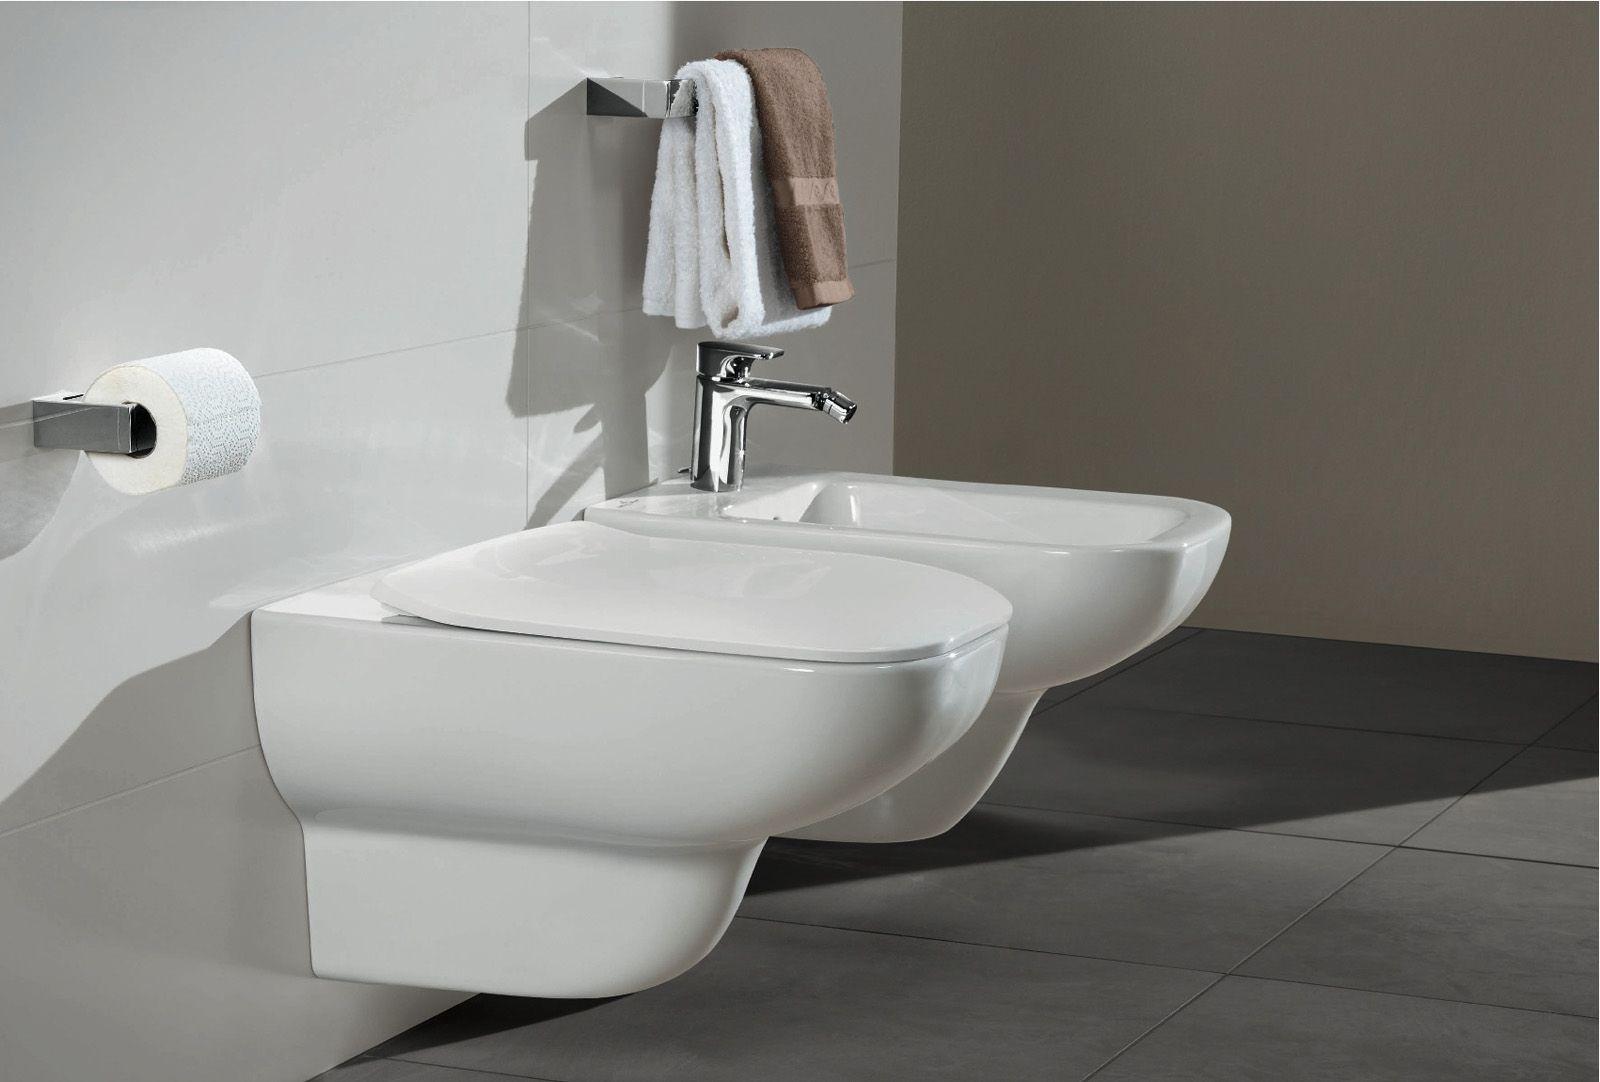 Sanitari ceramica per vasi e bidet sanitari wall hung toilet toilet e bathroom - Sanitari bagno dolomite prezzi ...